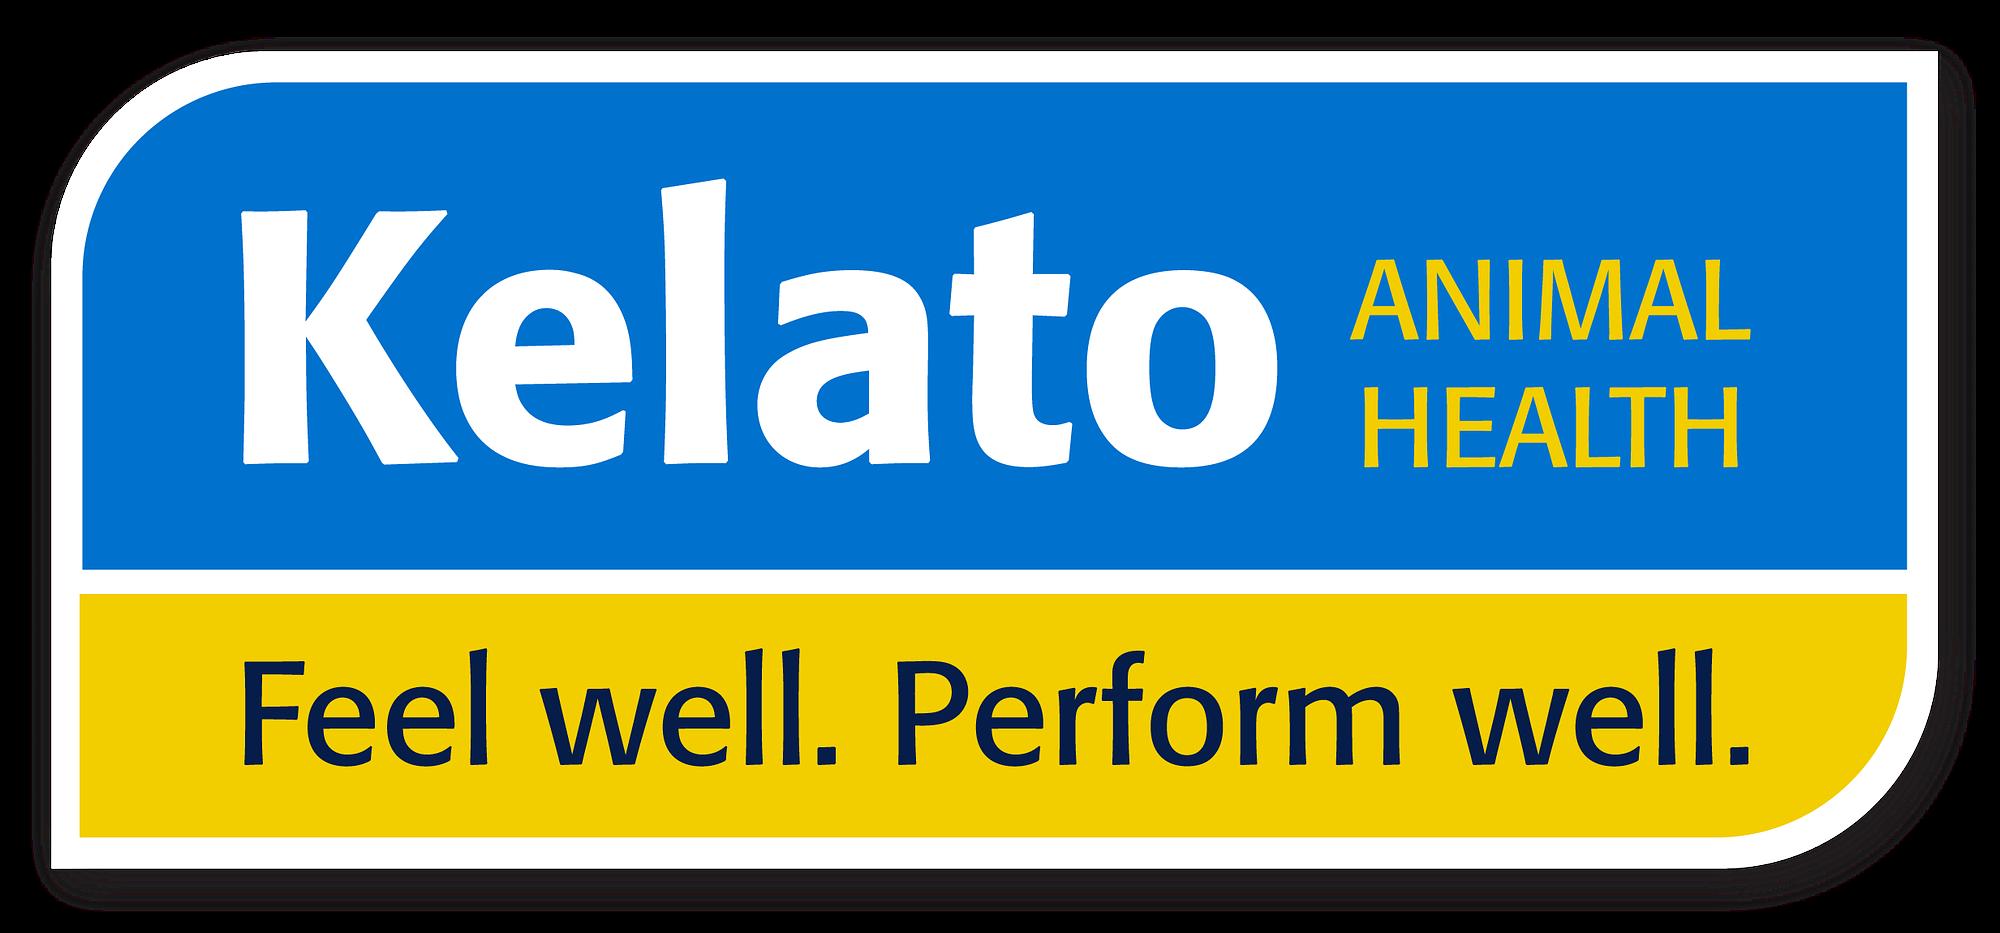 kelato health animal